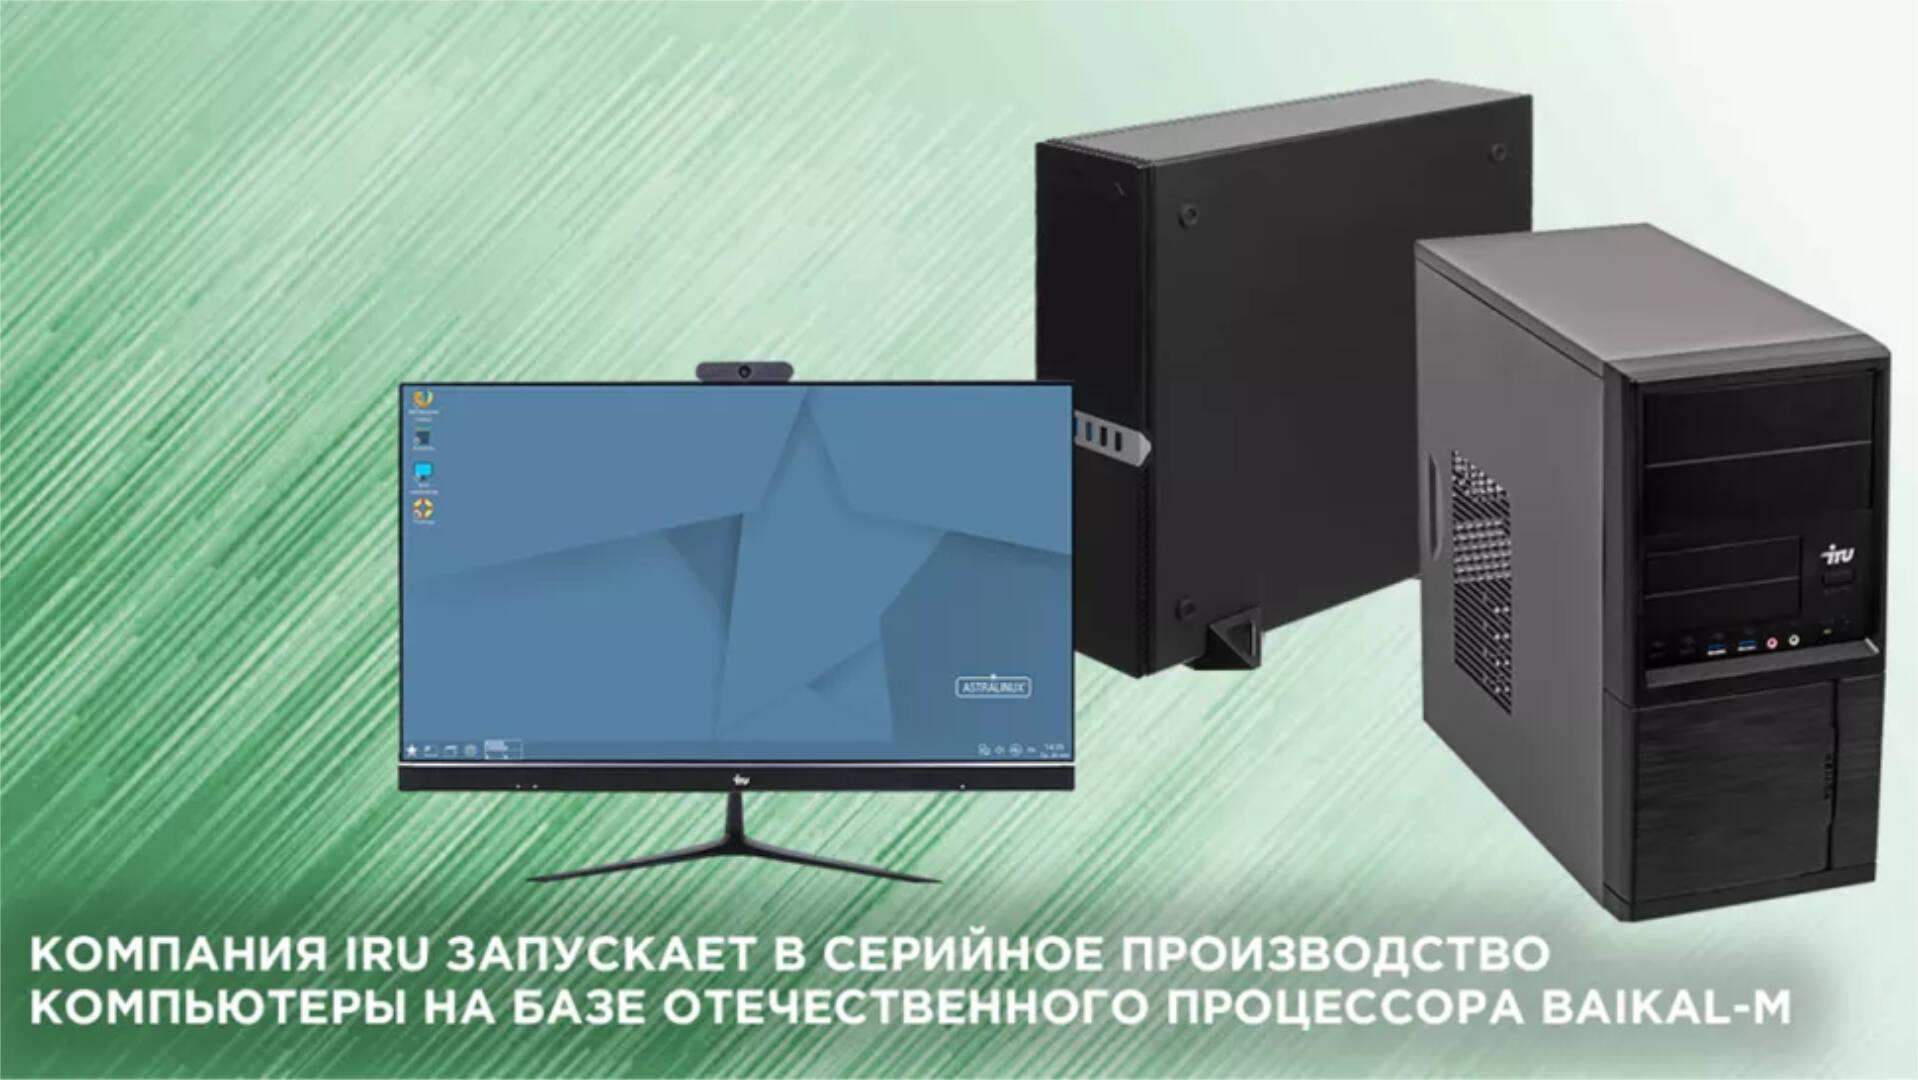 iRU ARM Linux PC Russia